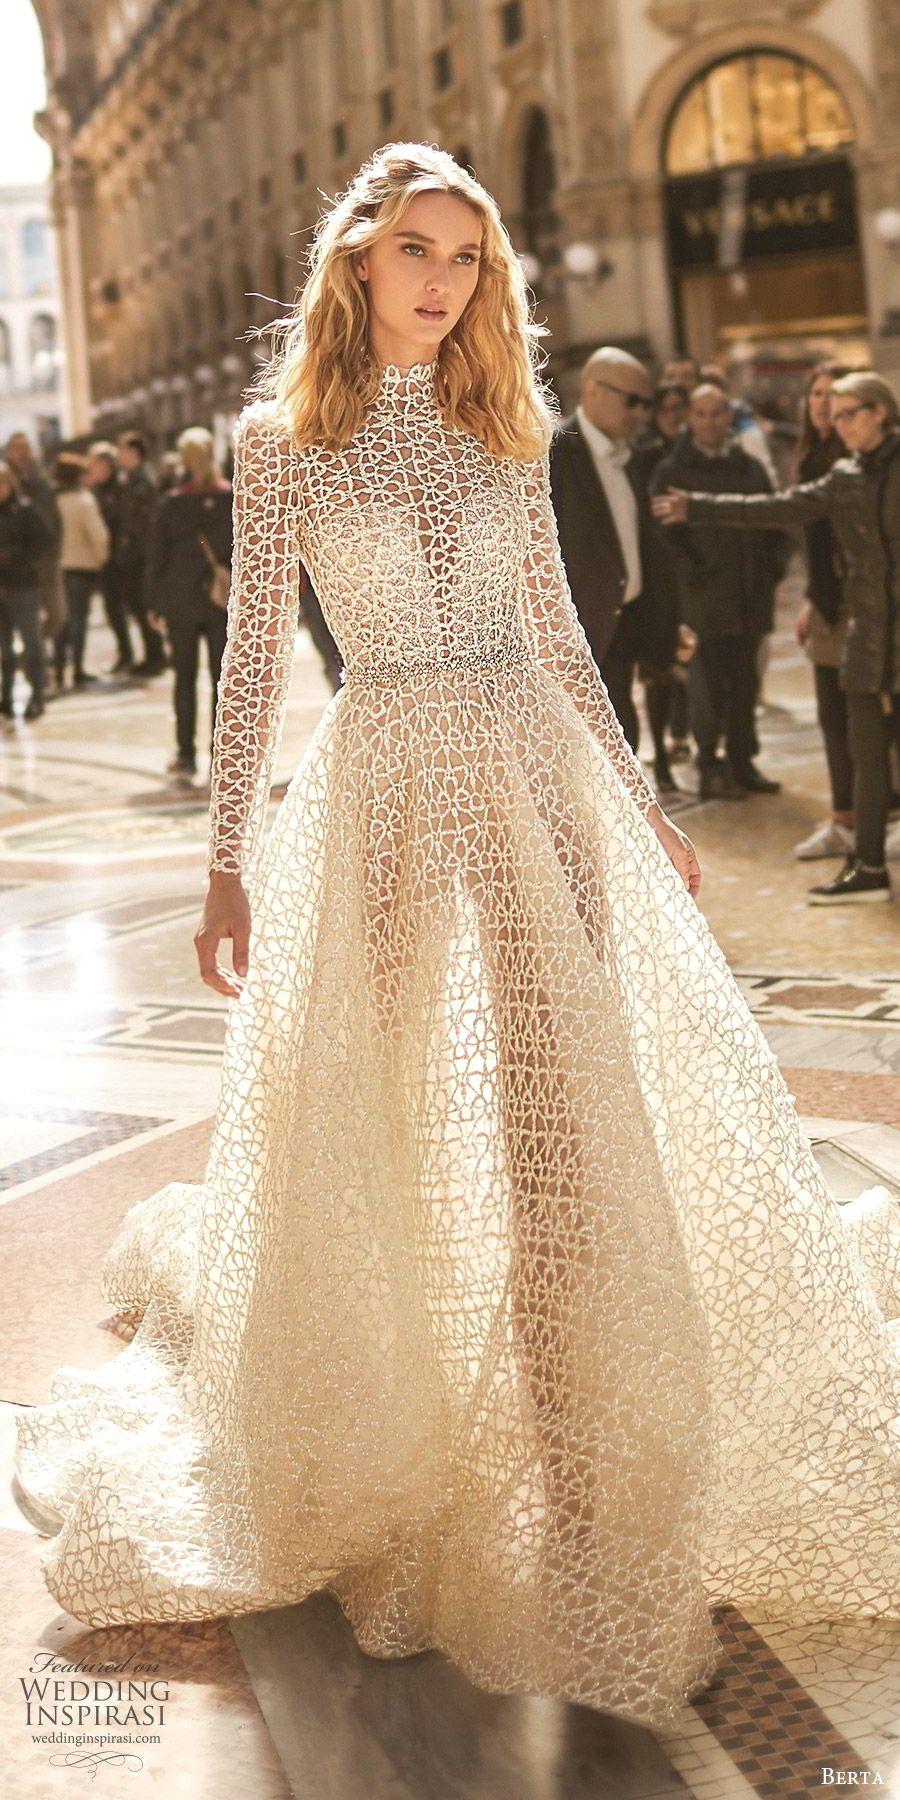 Wedding ceremony Inspirasi #wedding #weddings #bridal #weddingdress #weddingdresses #bride #style   #bertaweddingdress